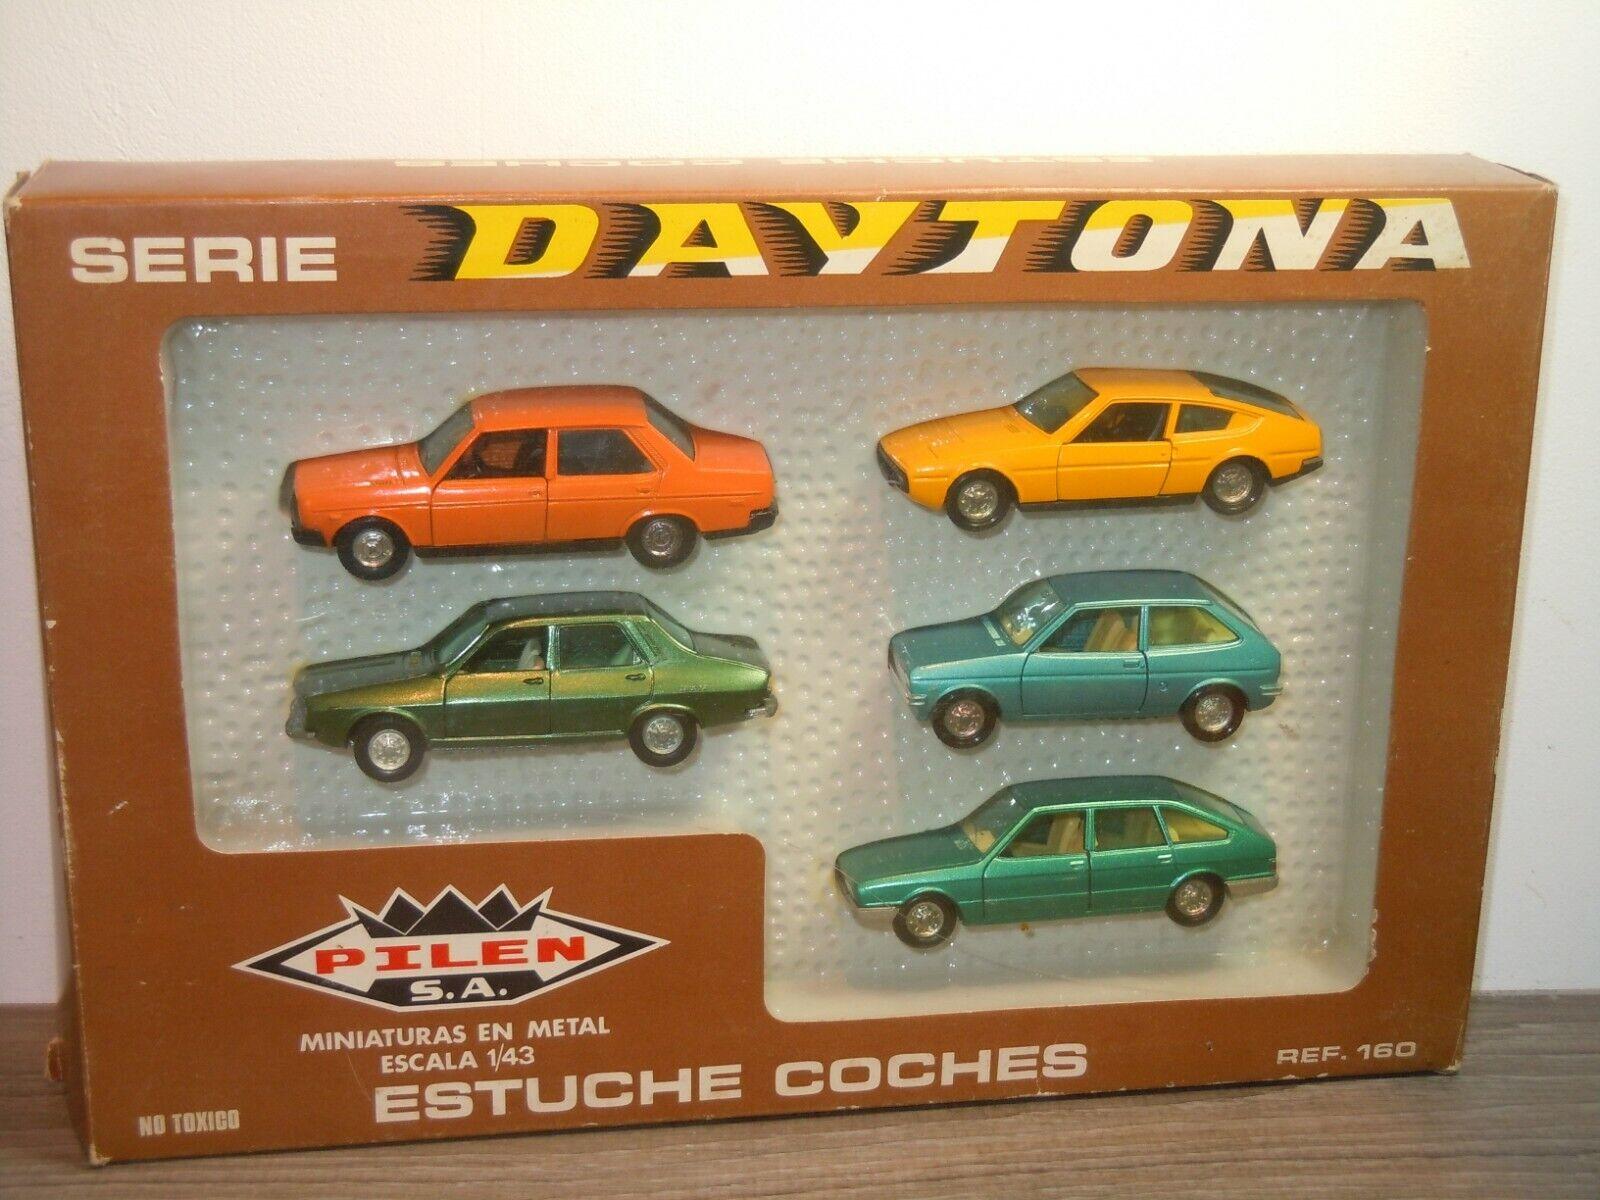 Asientos de la serie Dayton pilen giftset - - - Ford Renault Simca Matra - caja 36, 993 9b8